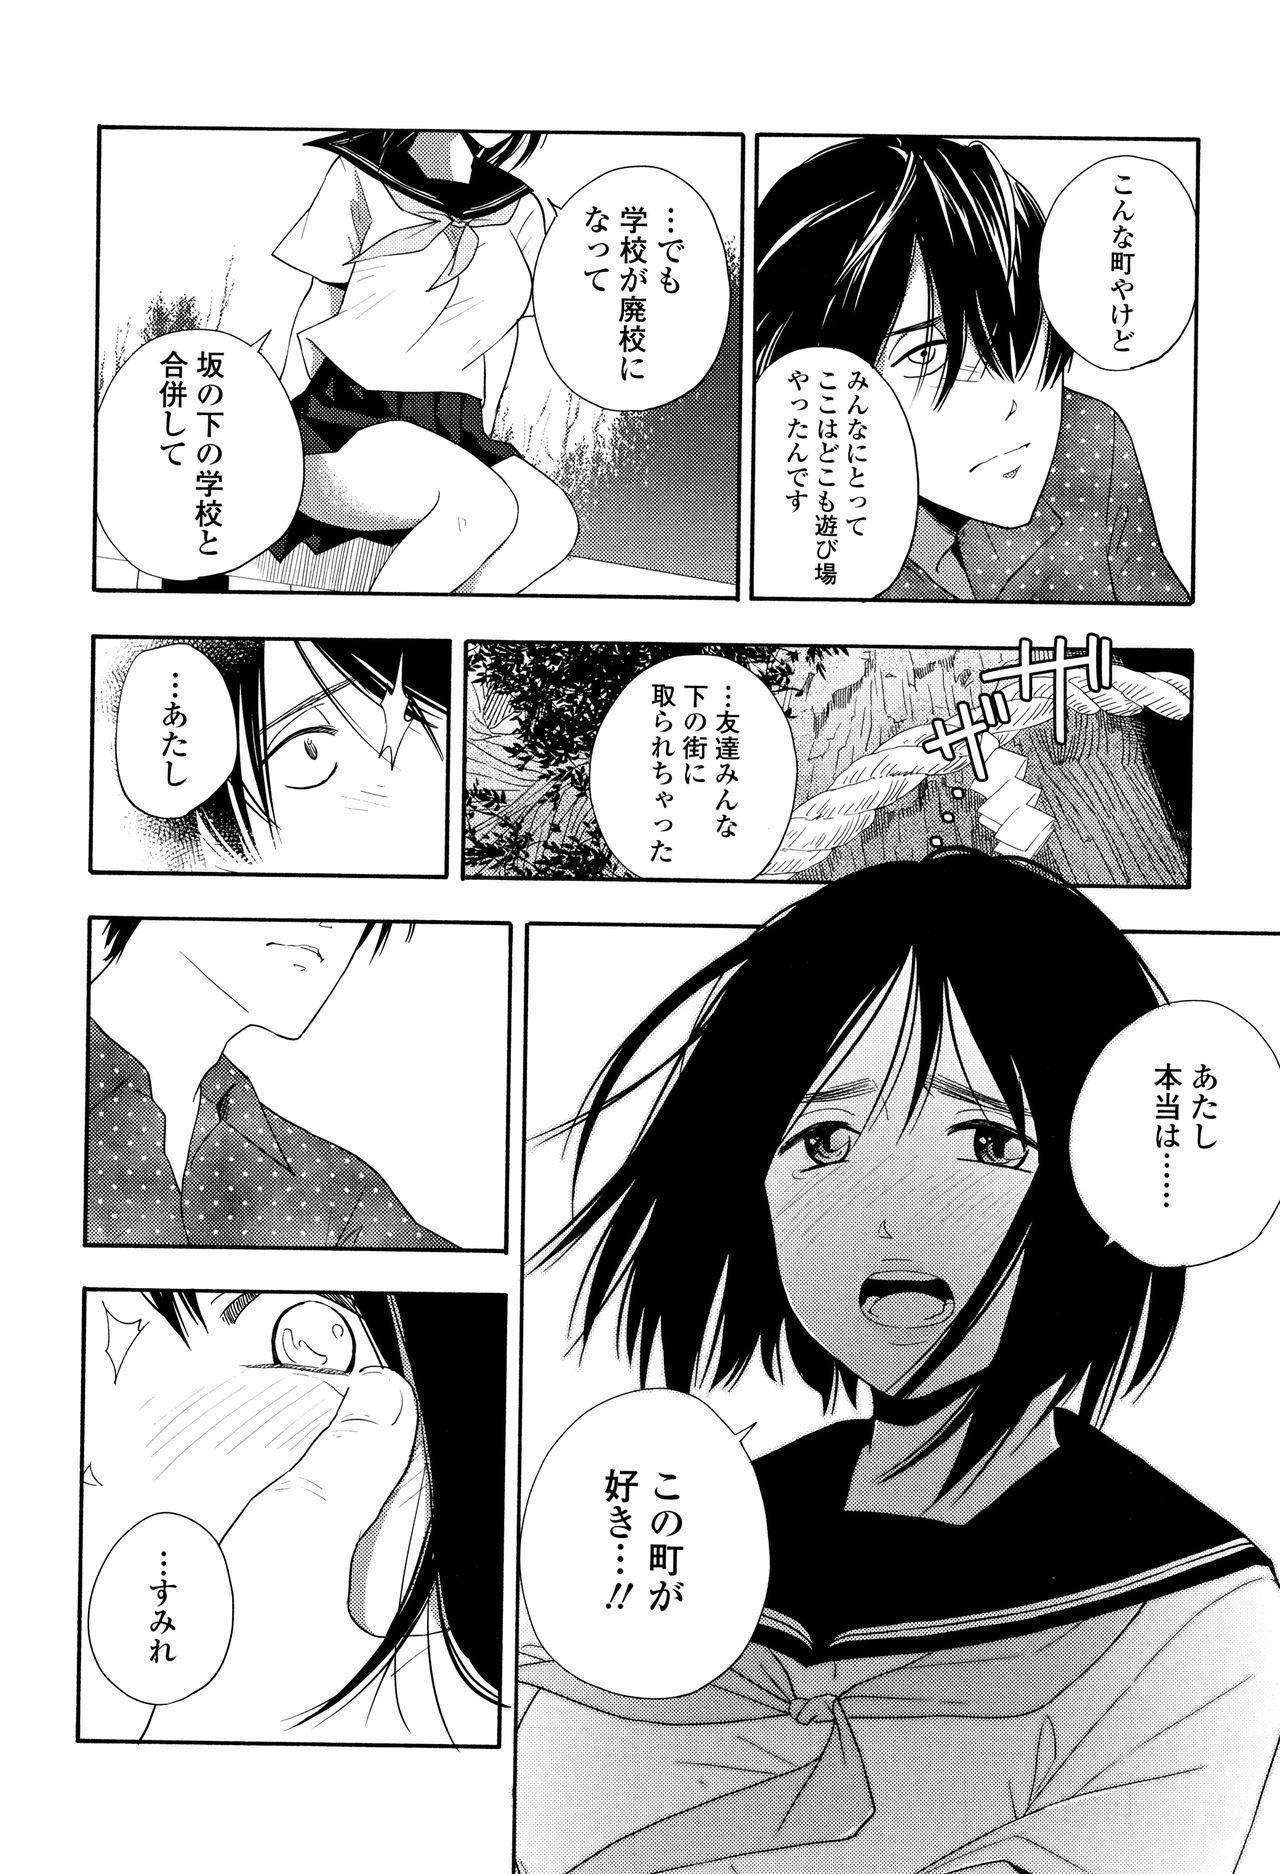 Shishunki no Eros - puberty eros 144